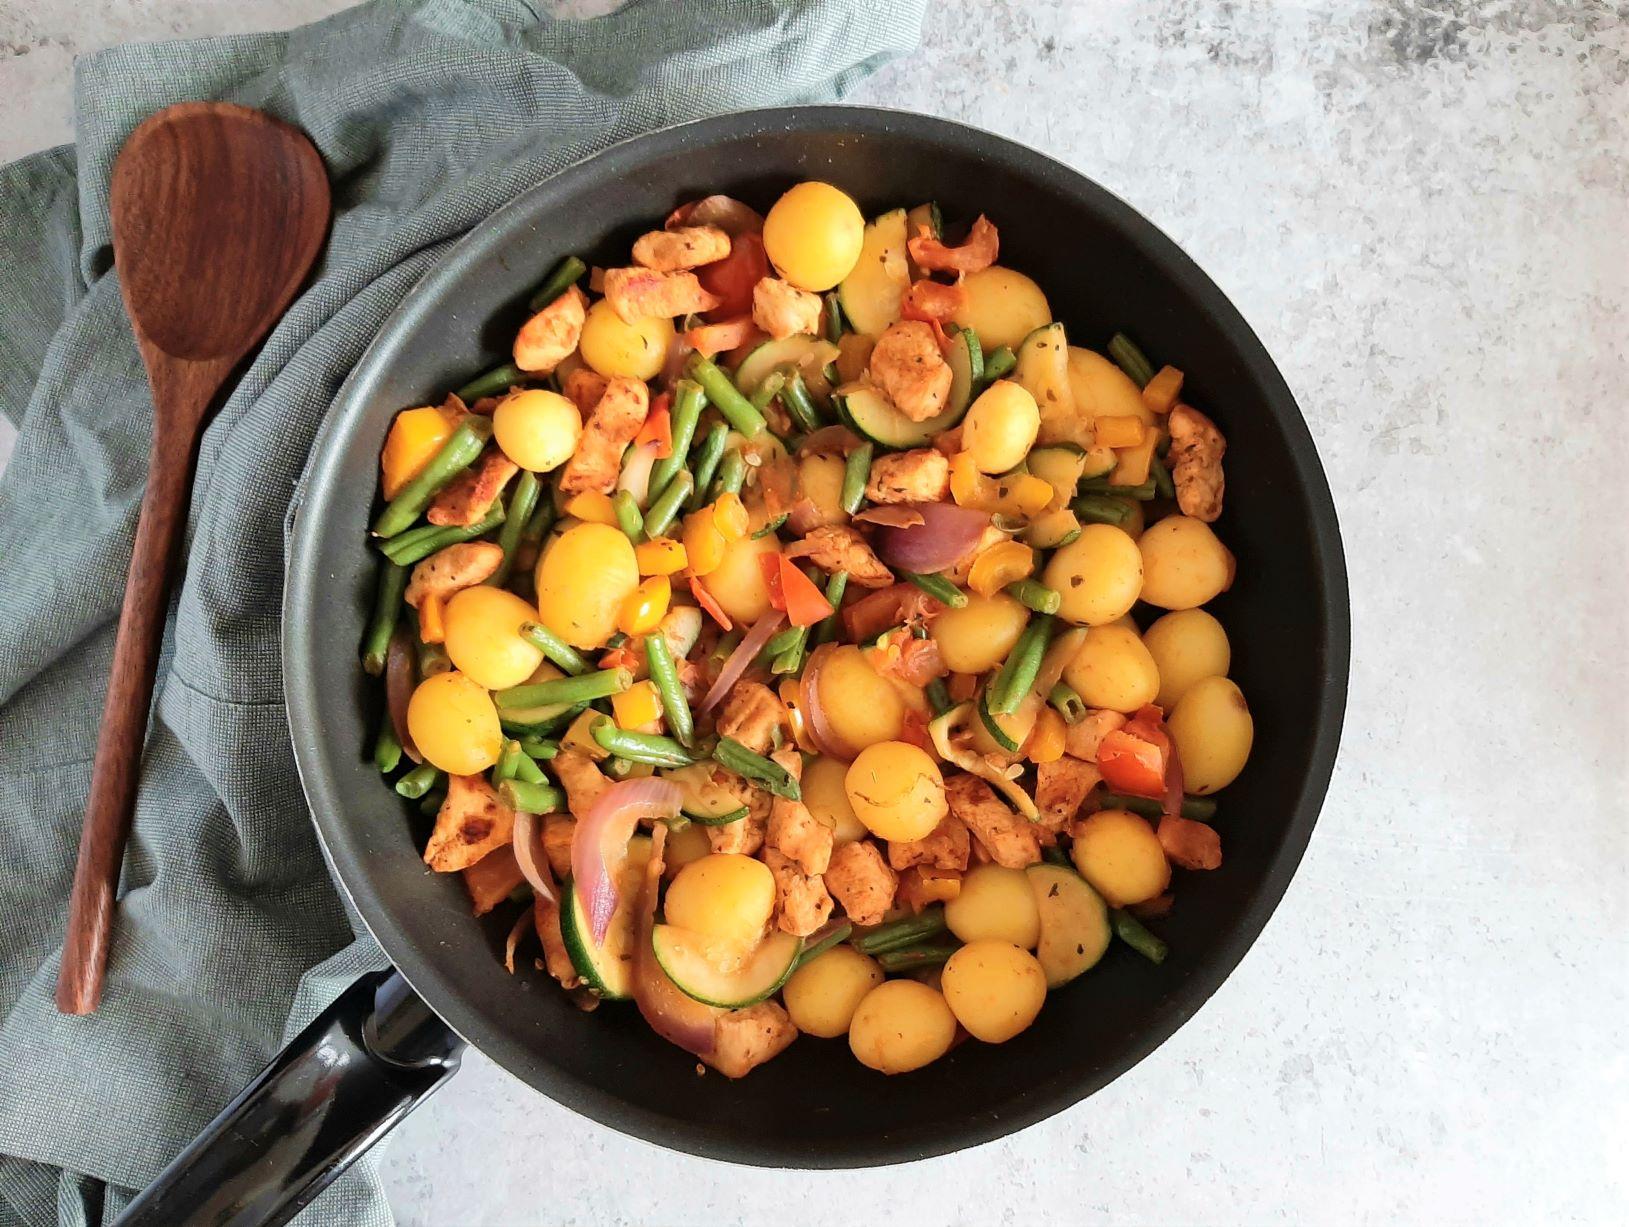 Aardappelpannetje met groenten en kip